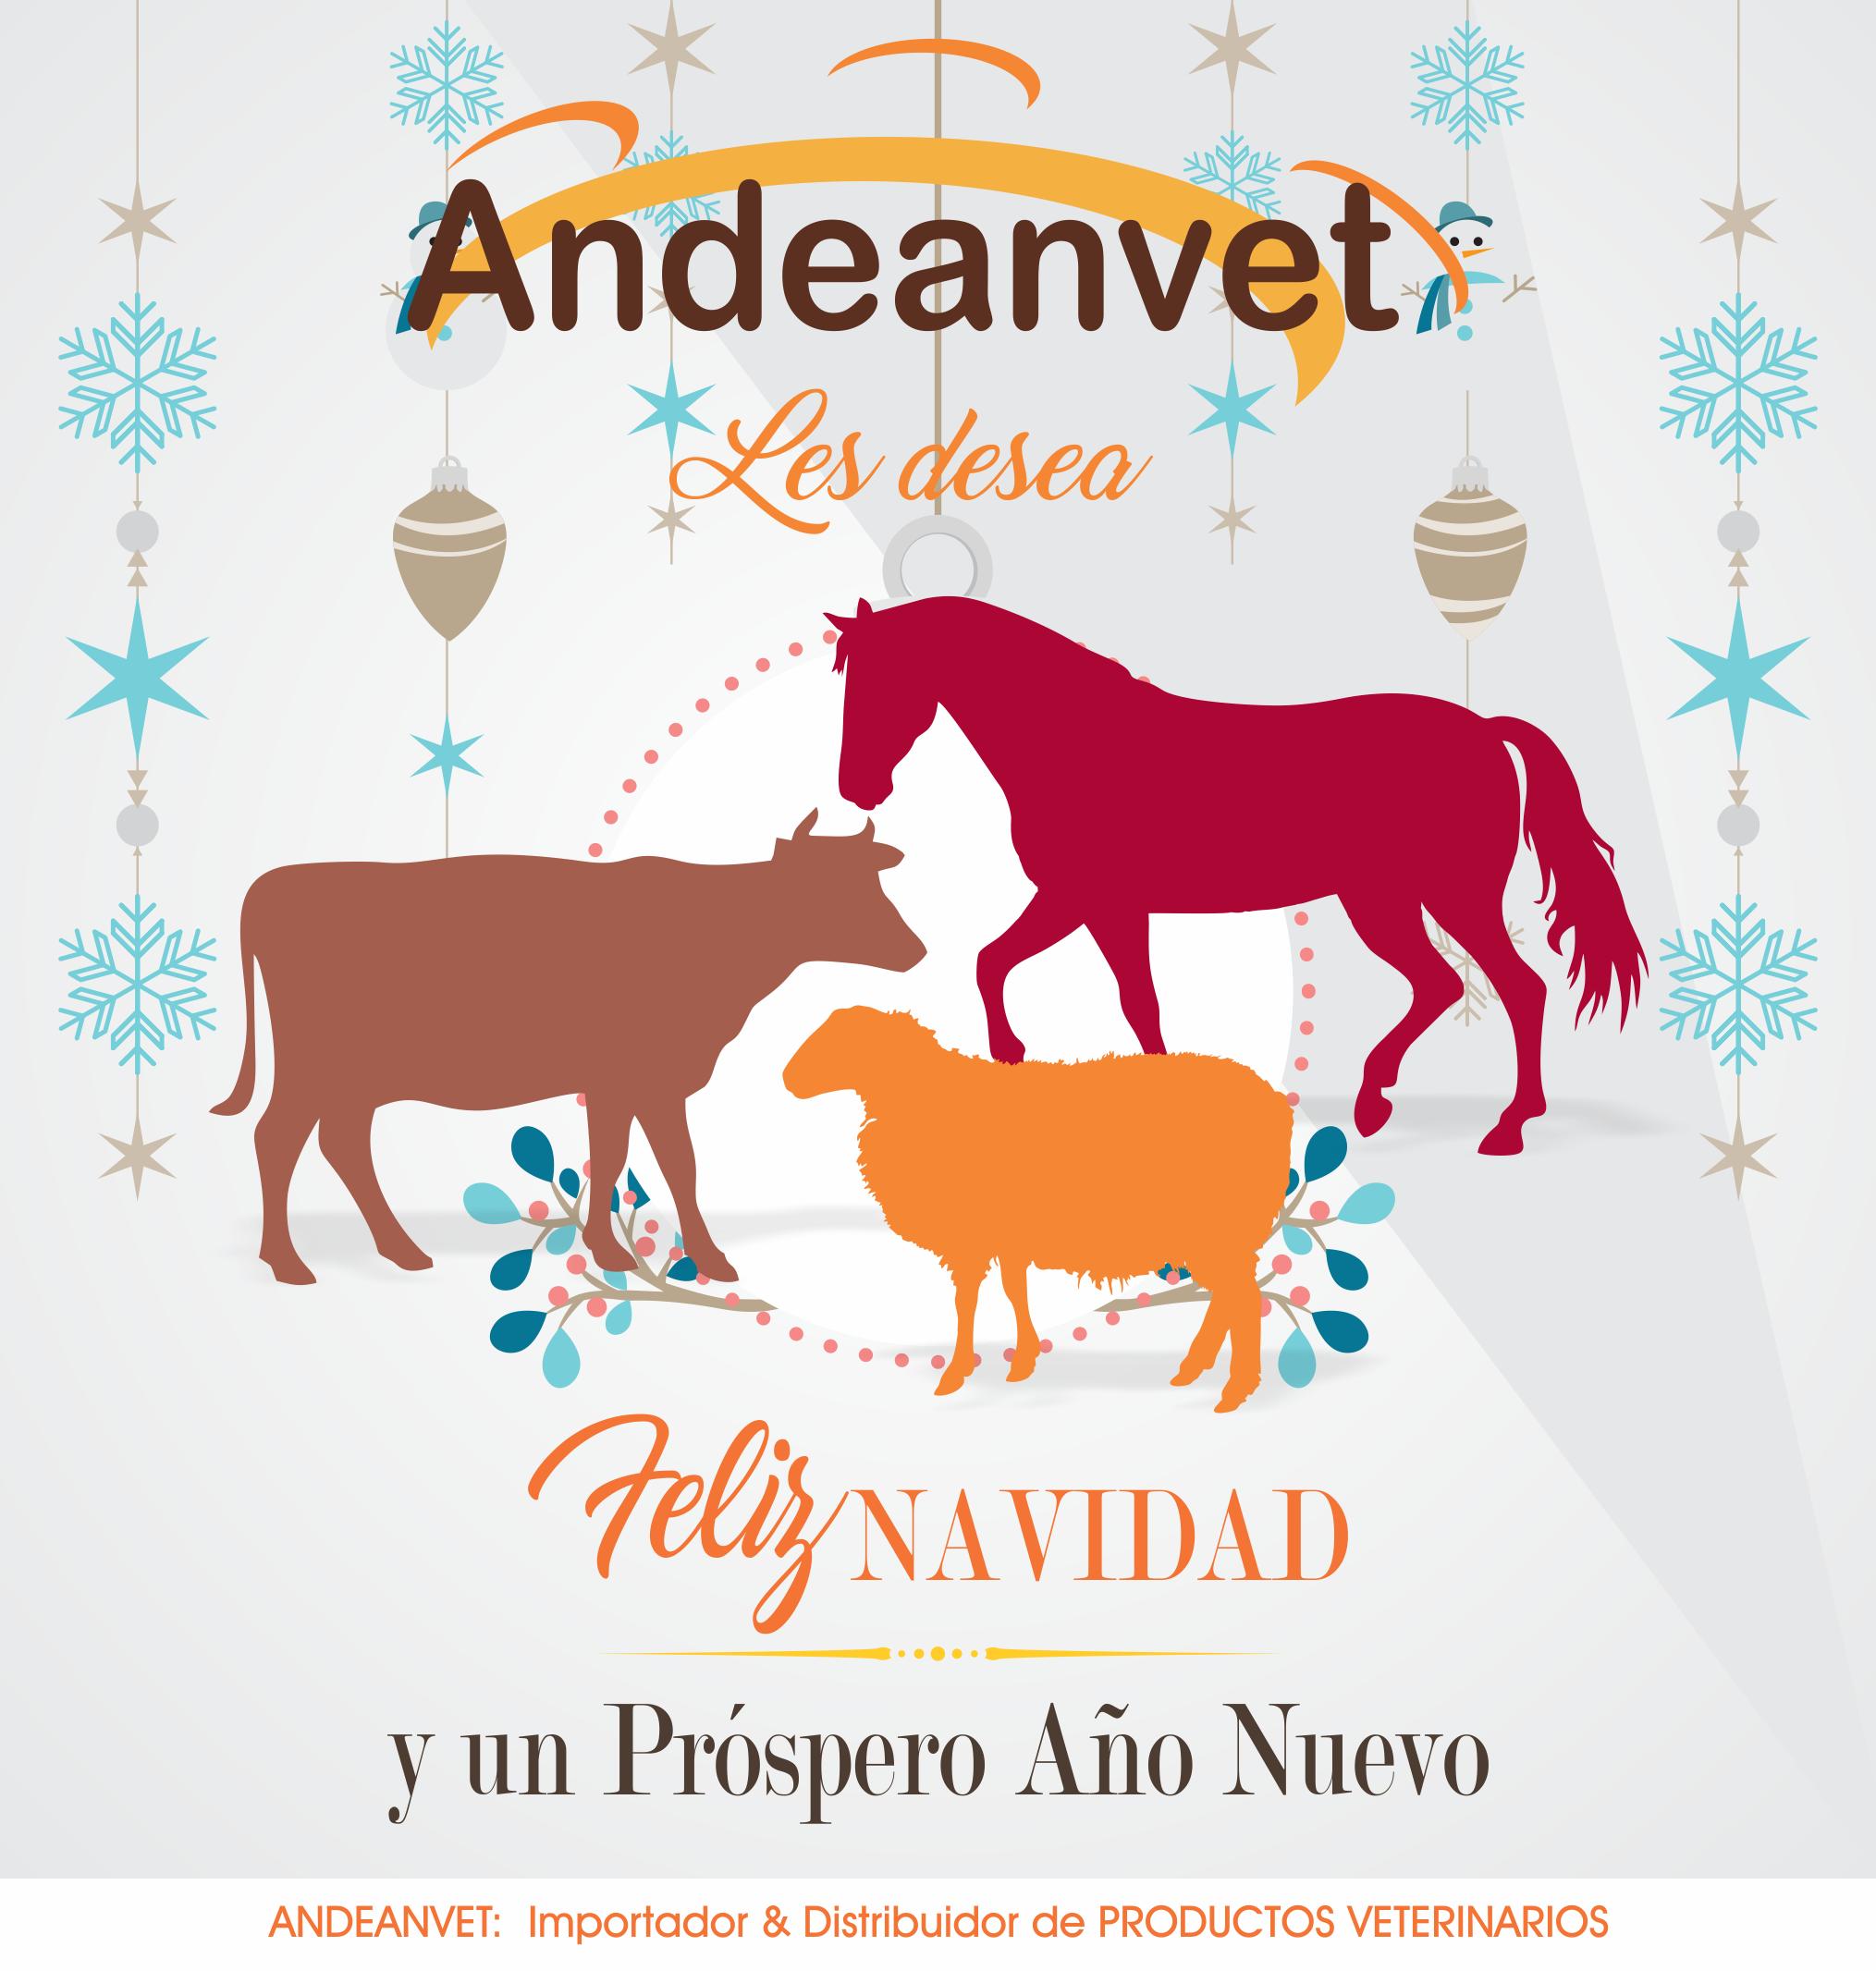 saludo-de-andeanvet-1